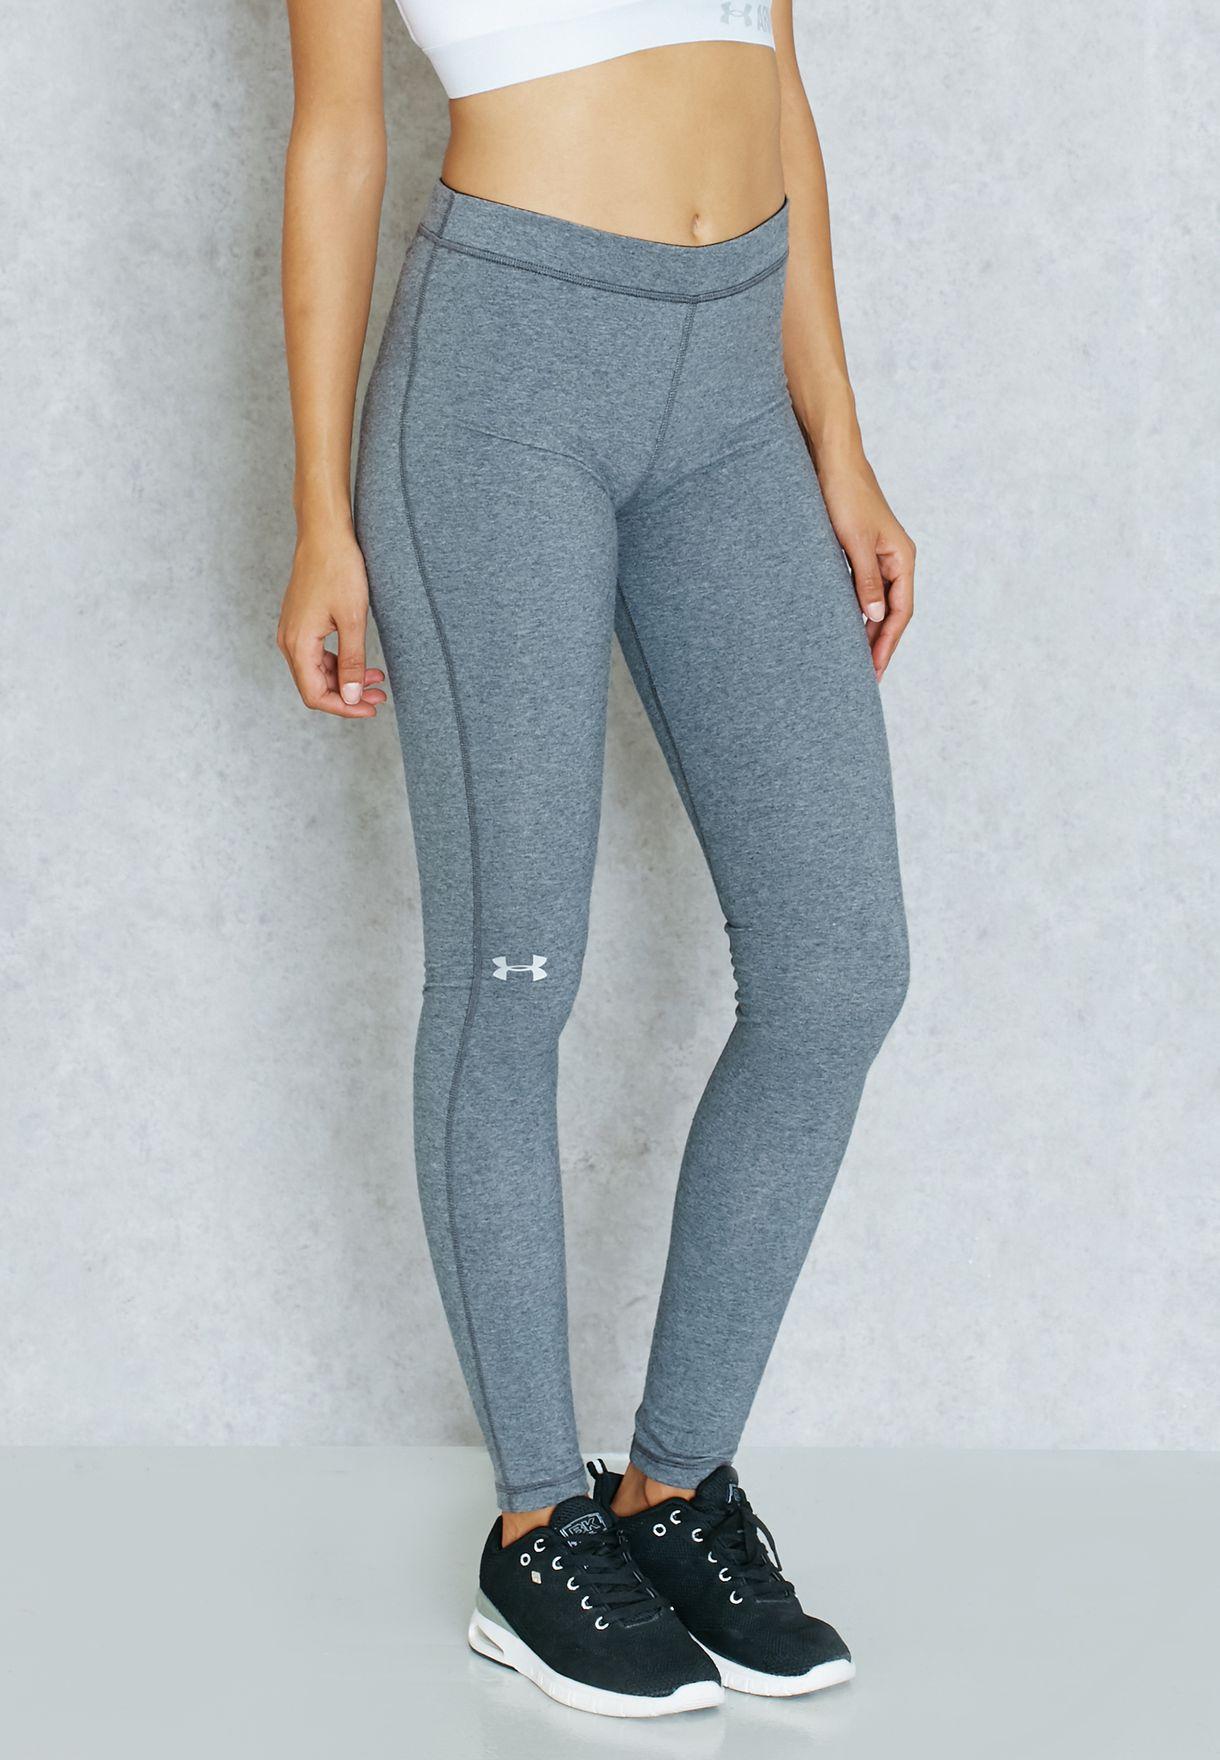 7f2060753d1d5 Shop Under Armour grey Favorite Legging 1287136-090 for Women in ...